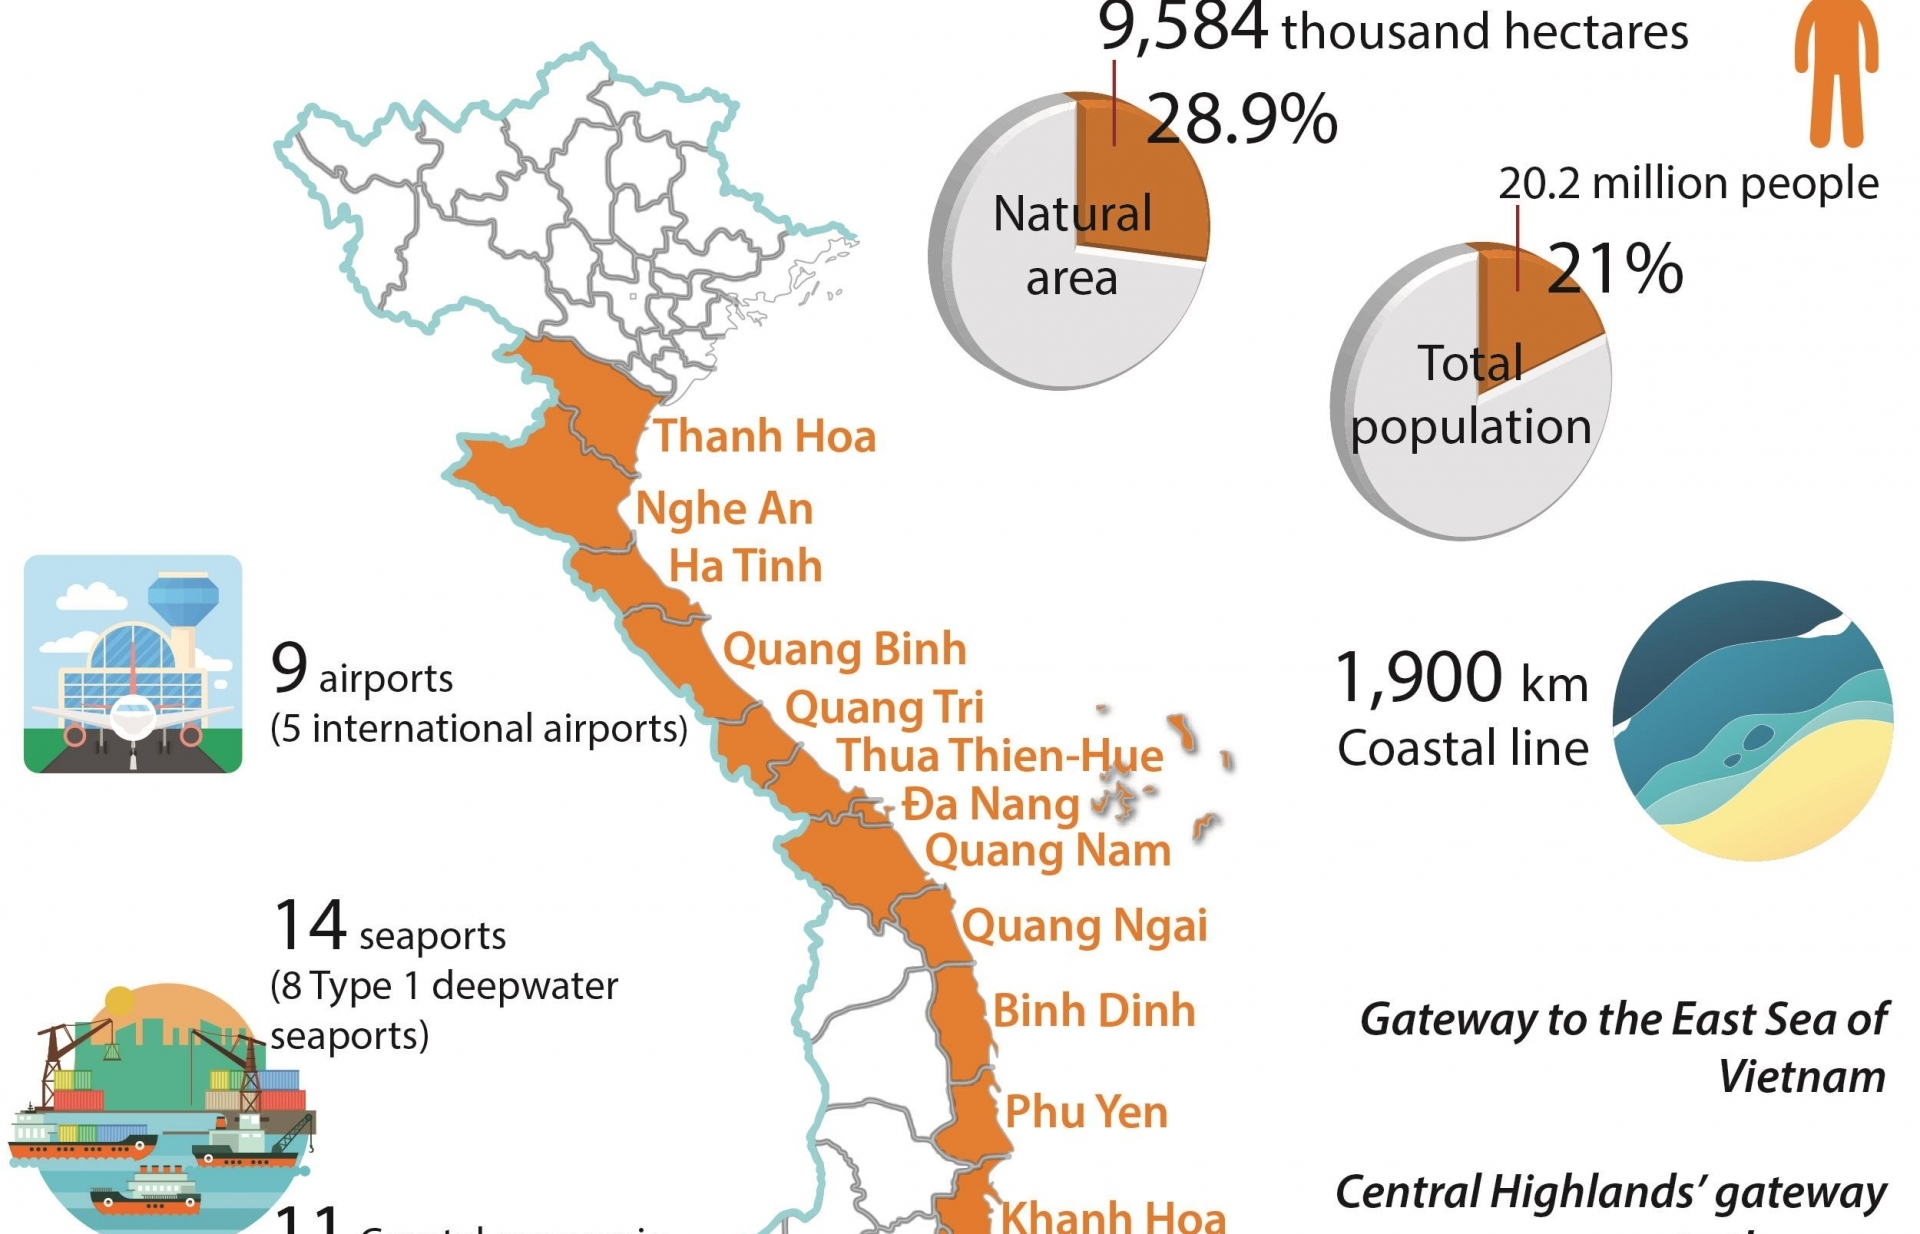 14 central provinces with huge economic potential